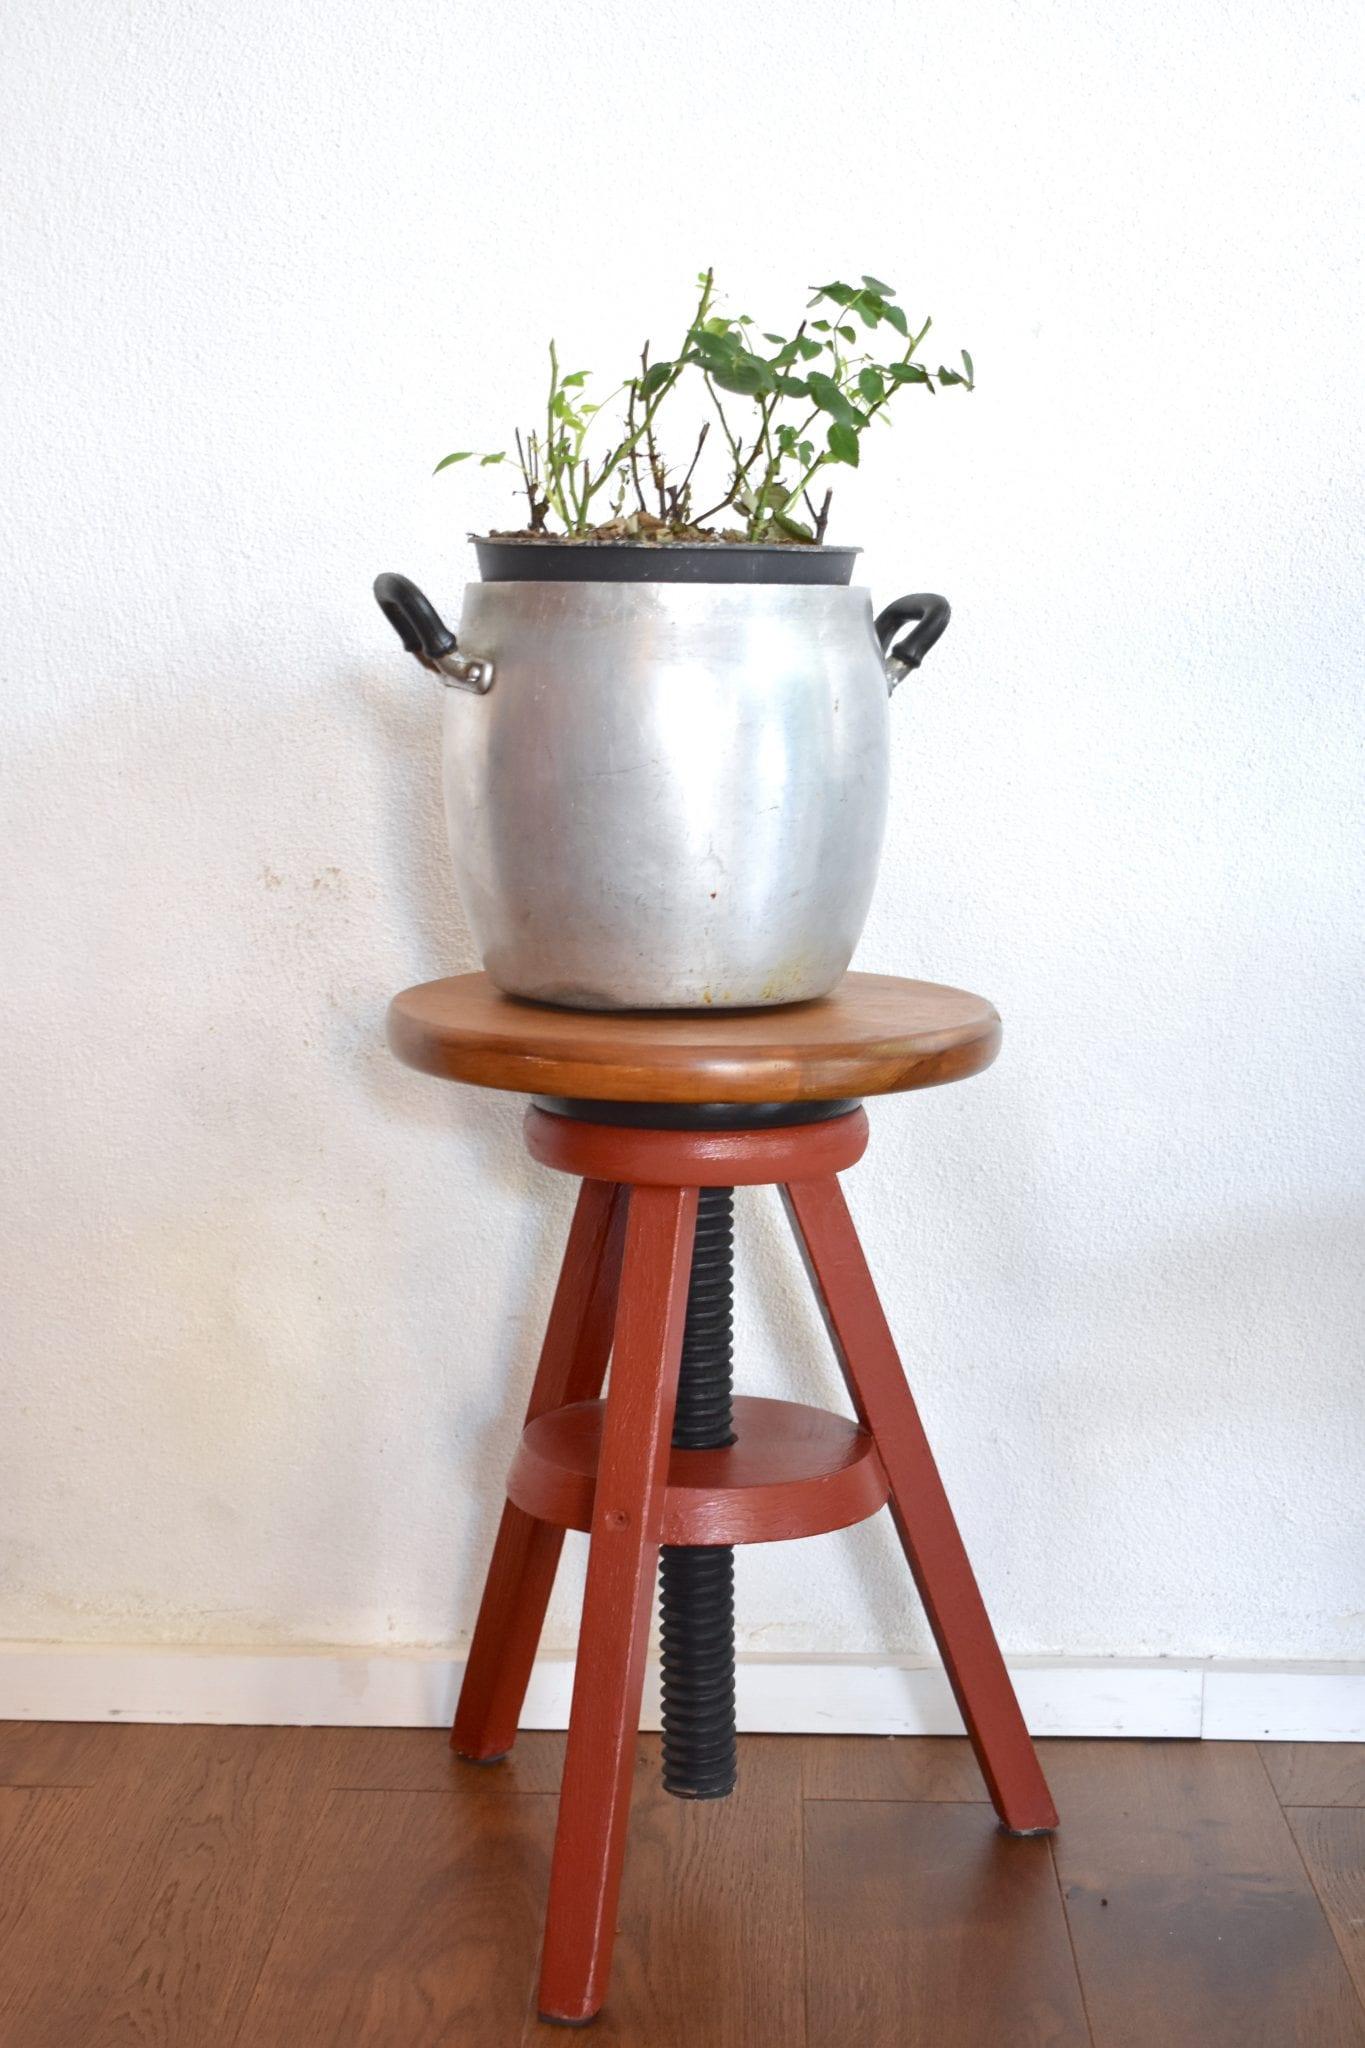 dettaglio pianta - PestaPepe - LePlume